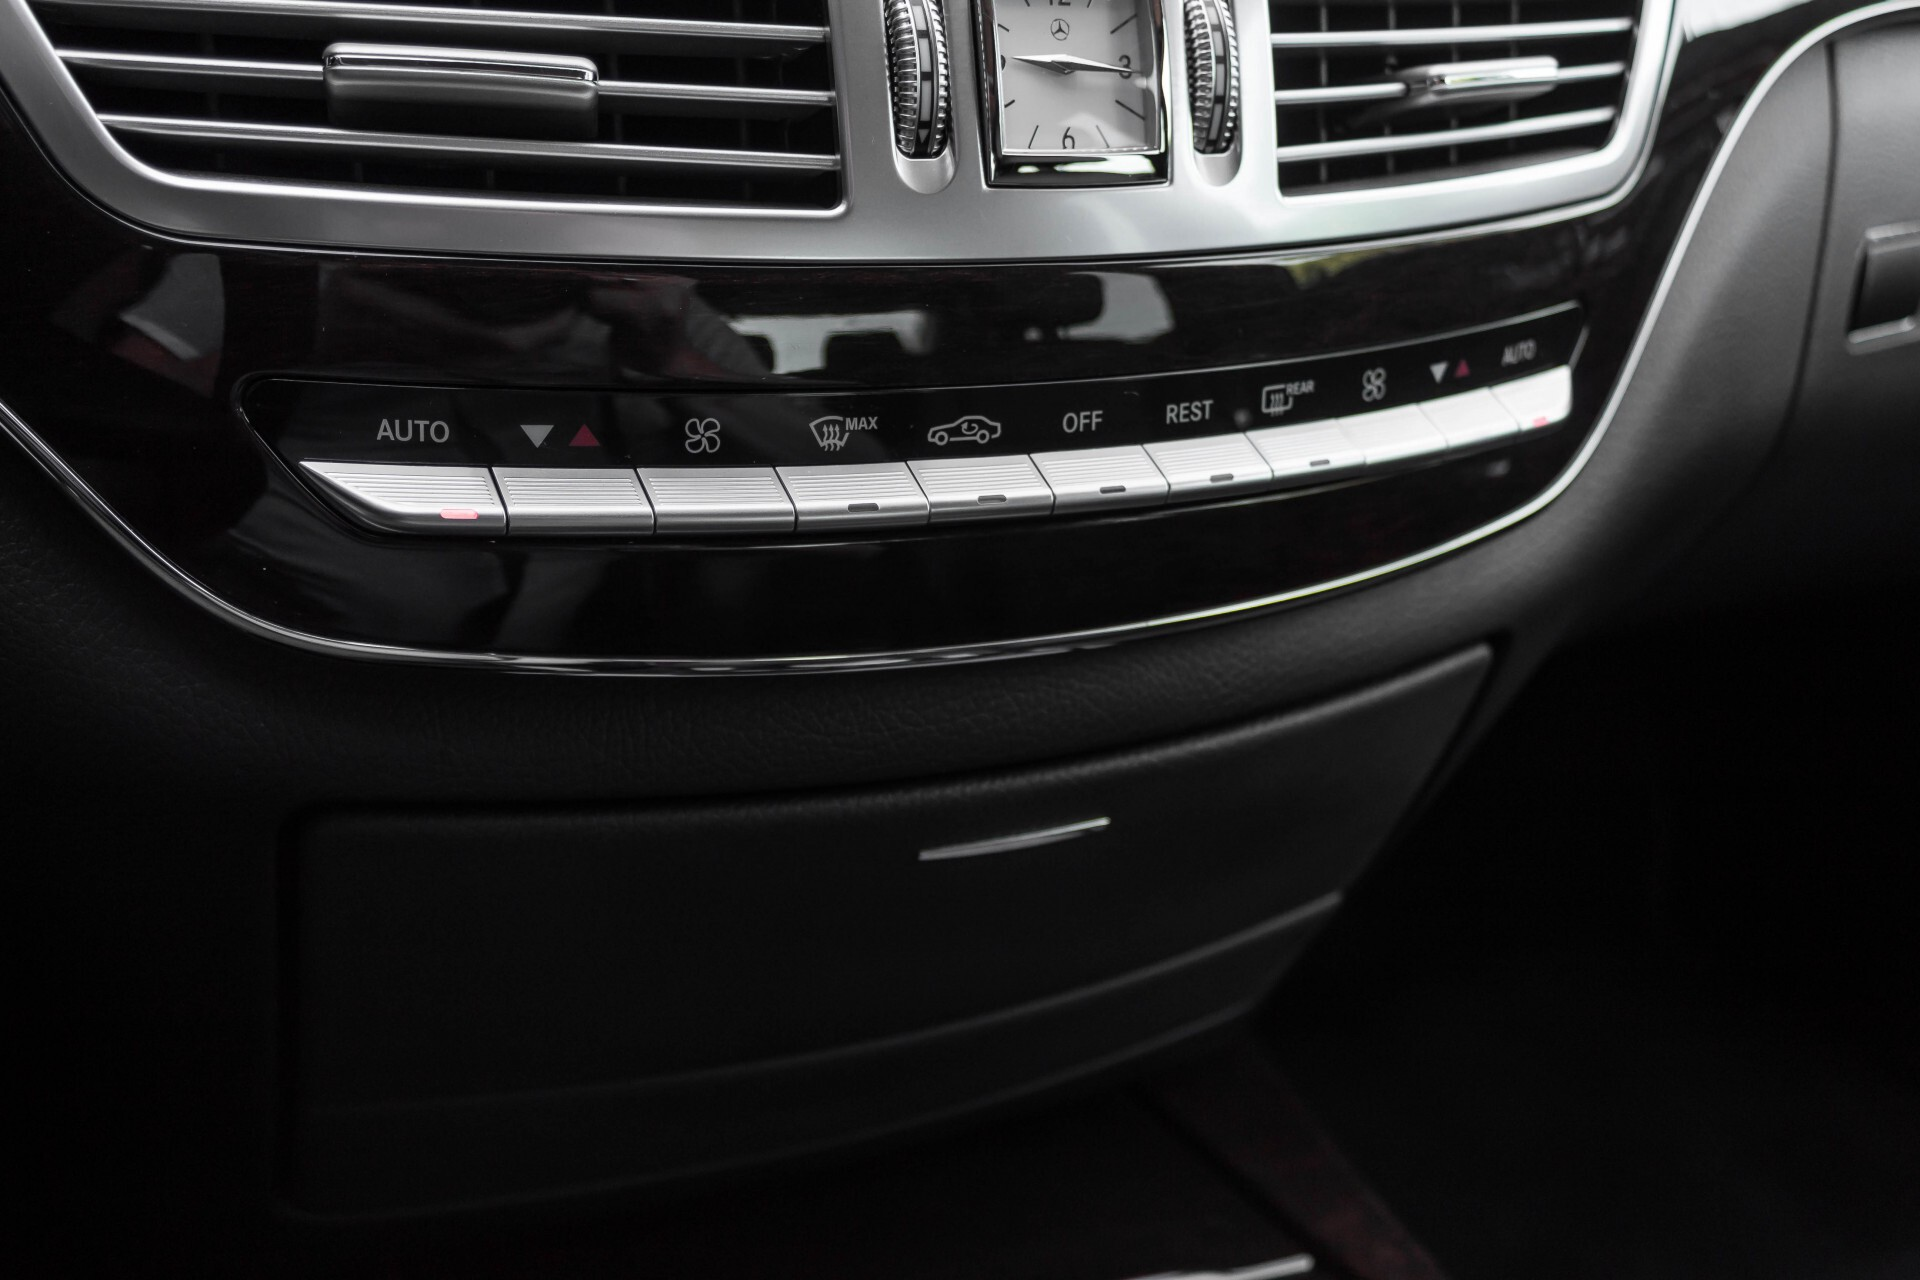 Mercedes-Benz S-Klasse 350 Bluetec Keyless/Distronic/Nightvision/Schuifdak/Harman-Kardon Aut7 Foto 21